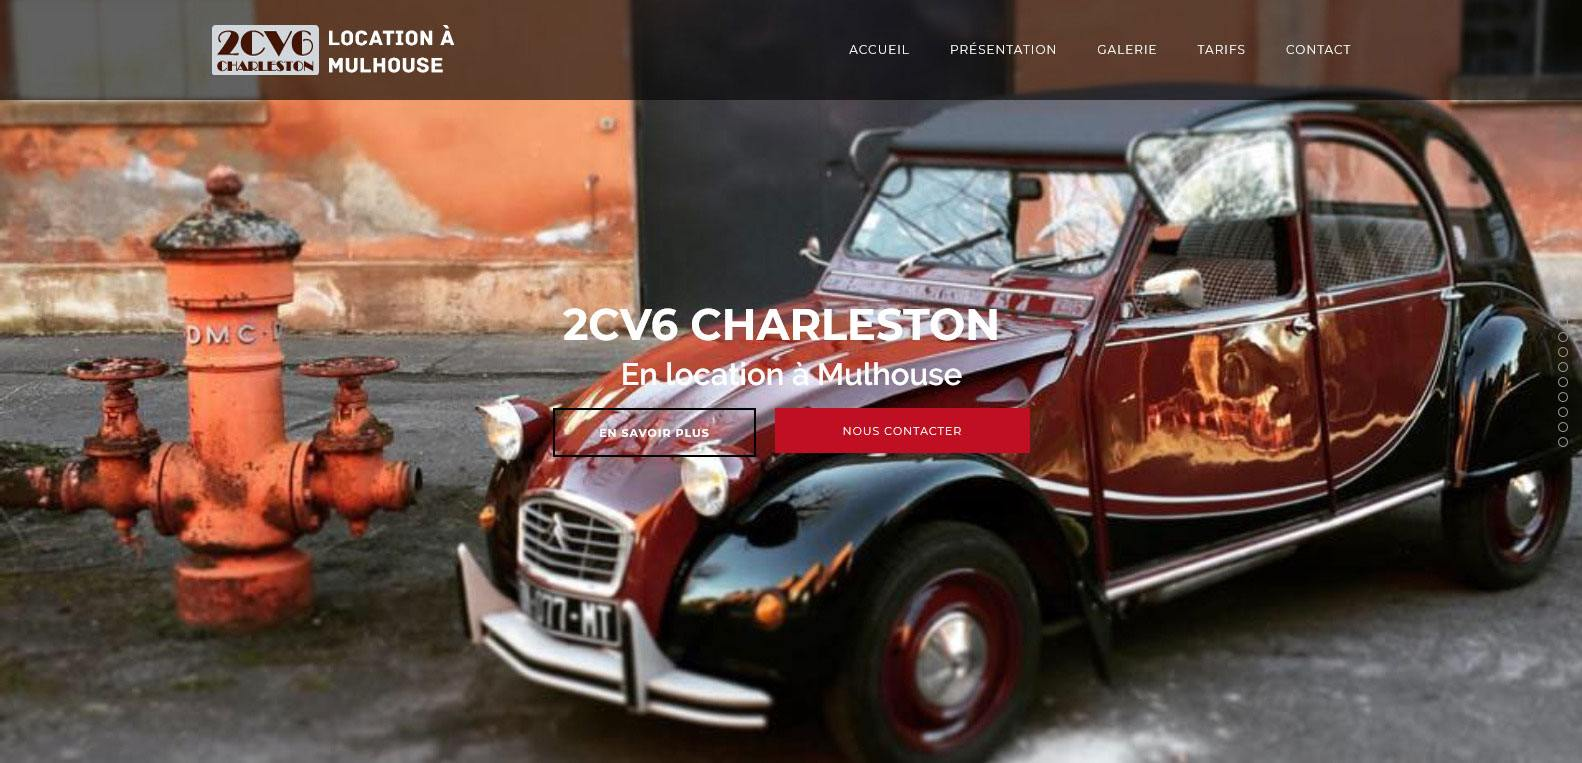 2CV V6 Charleston, location de 2CV à Mulhouse, client Karedess, agence web situé à Mulhouse